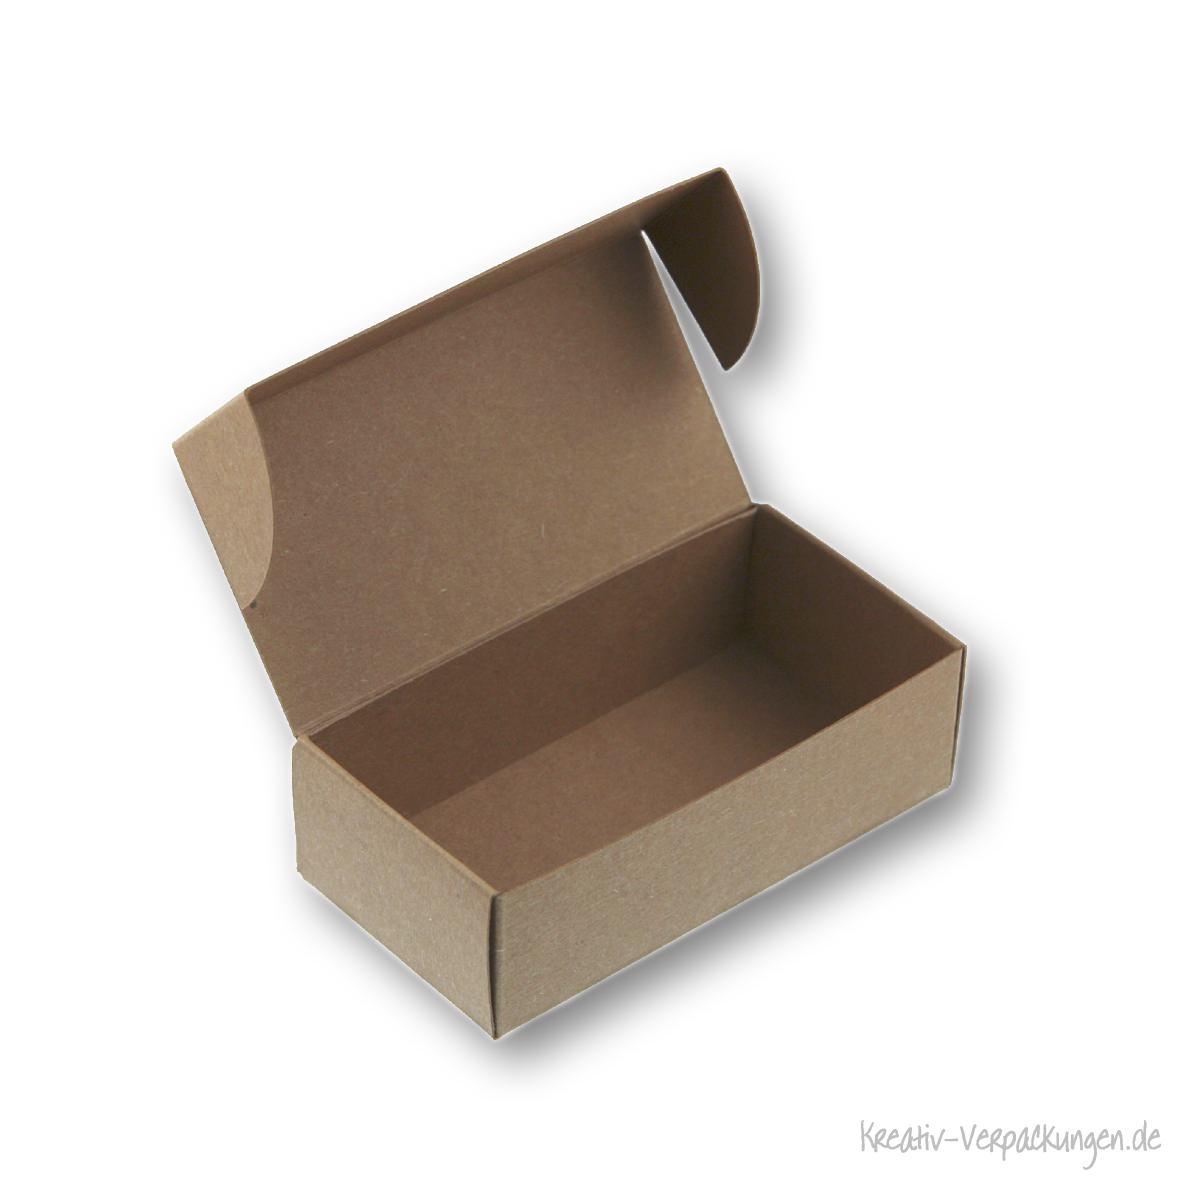 Zelt Aus Karton : Kreative falt klappdeckelboxen aus karton